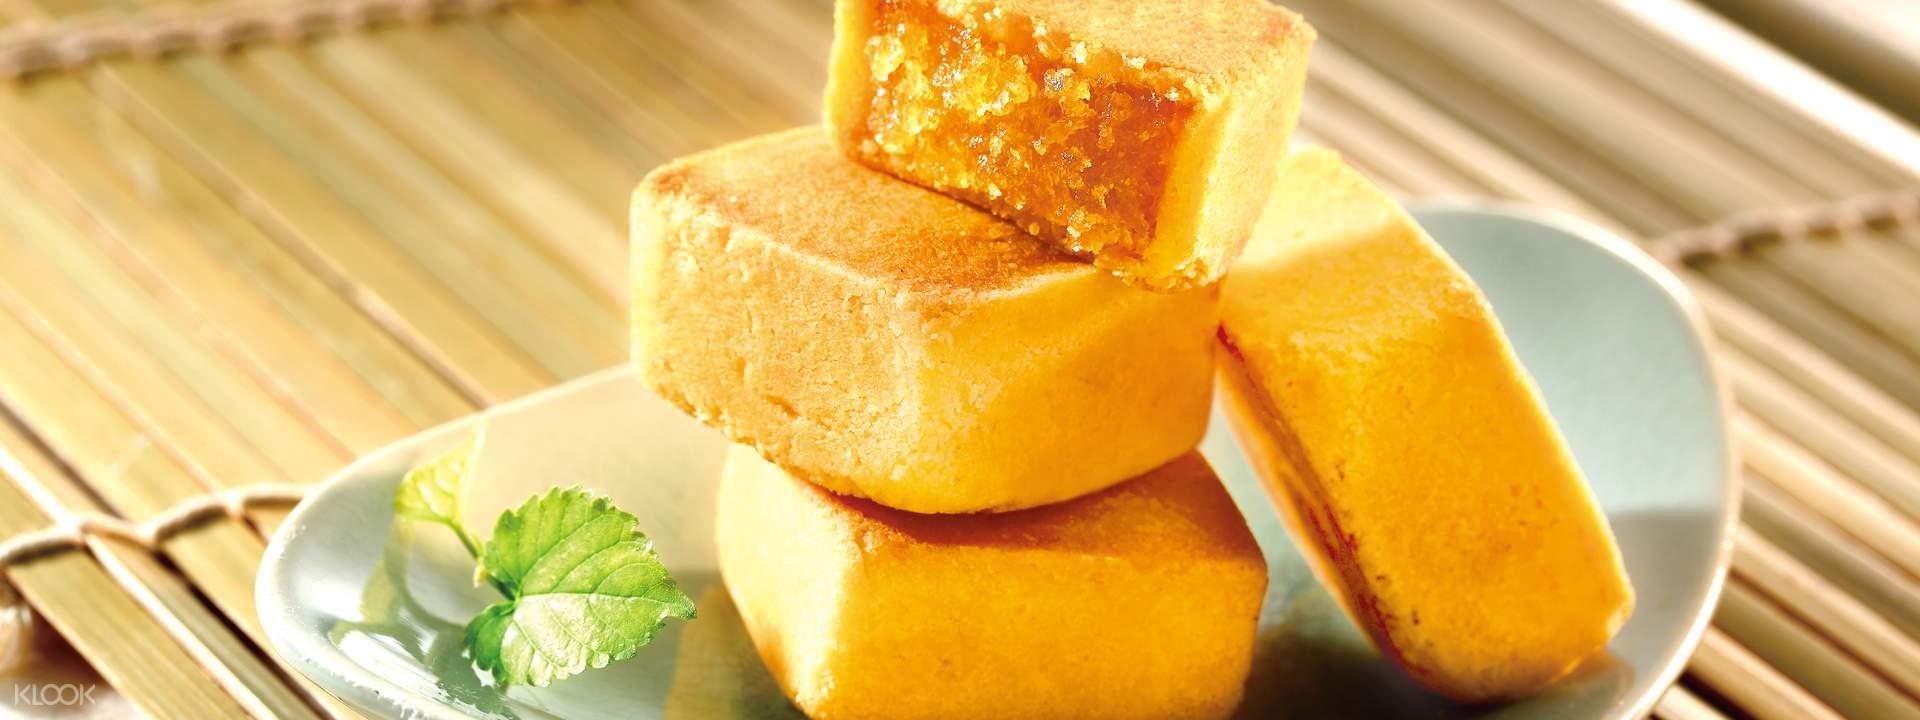 Chia Te Pineapple Cake Ingredients